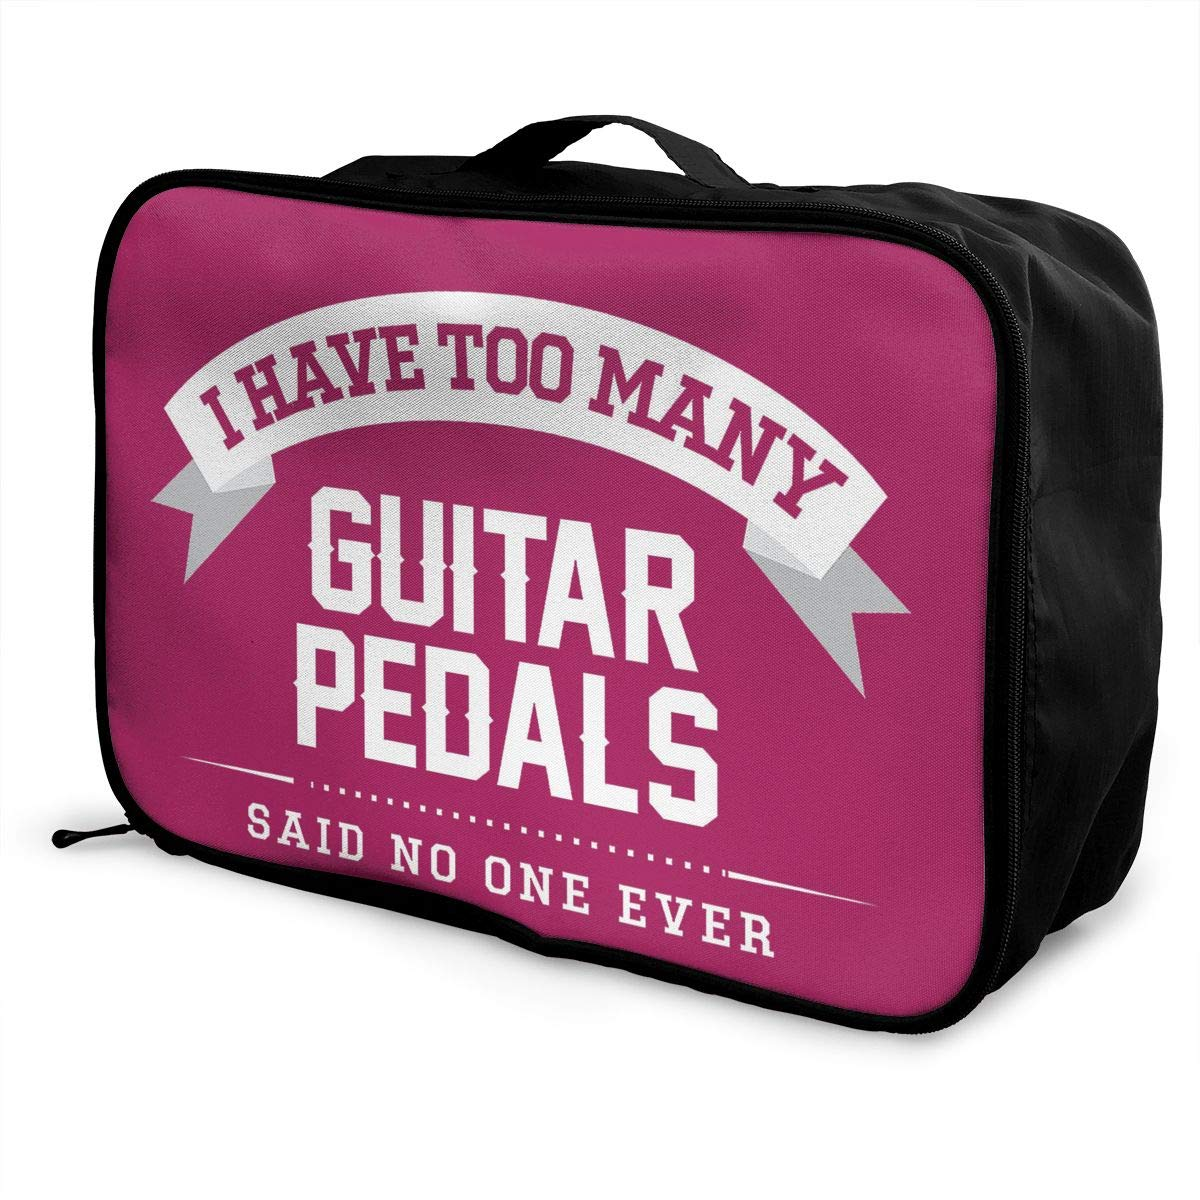 Travel Luggage Duffle Bag Lightweight Portable Handbag Guitar Pedals Large Capacity Waterproof Foldable Storage Tote